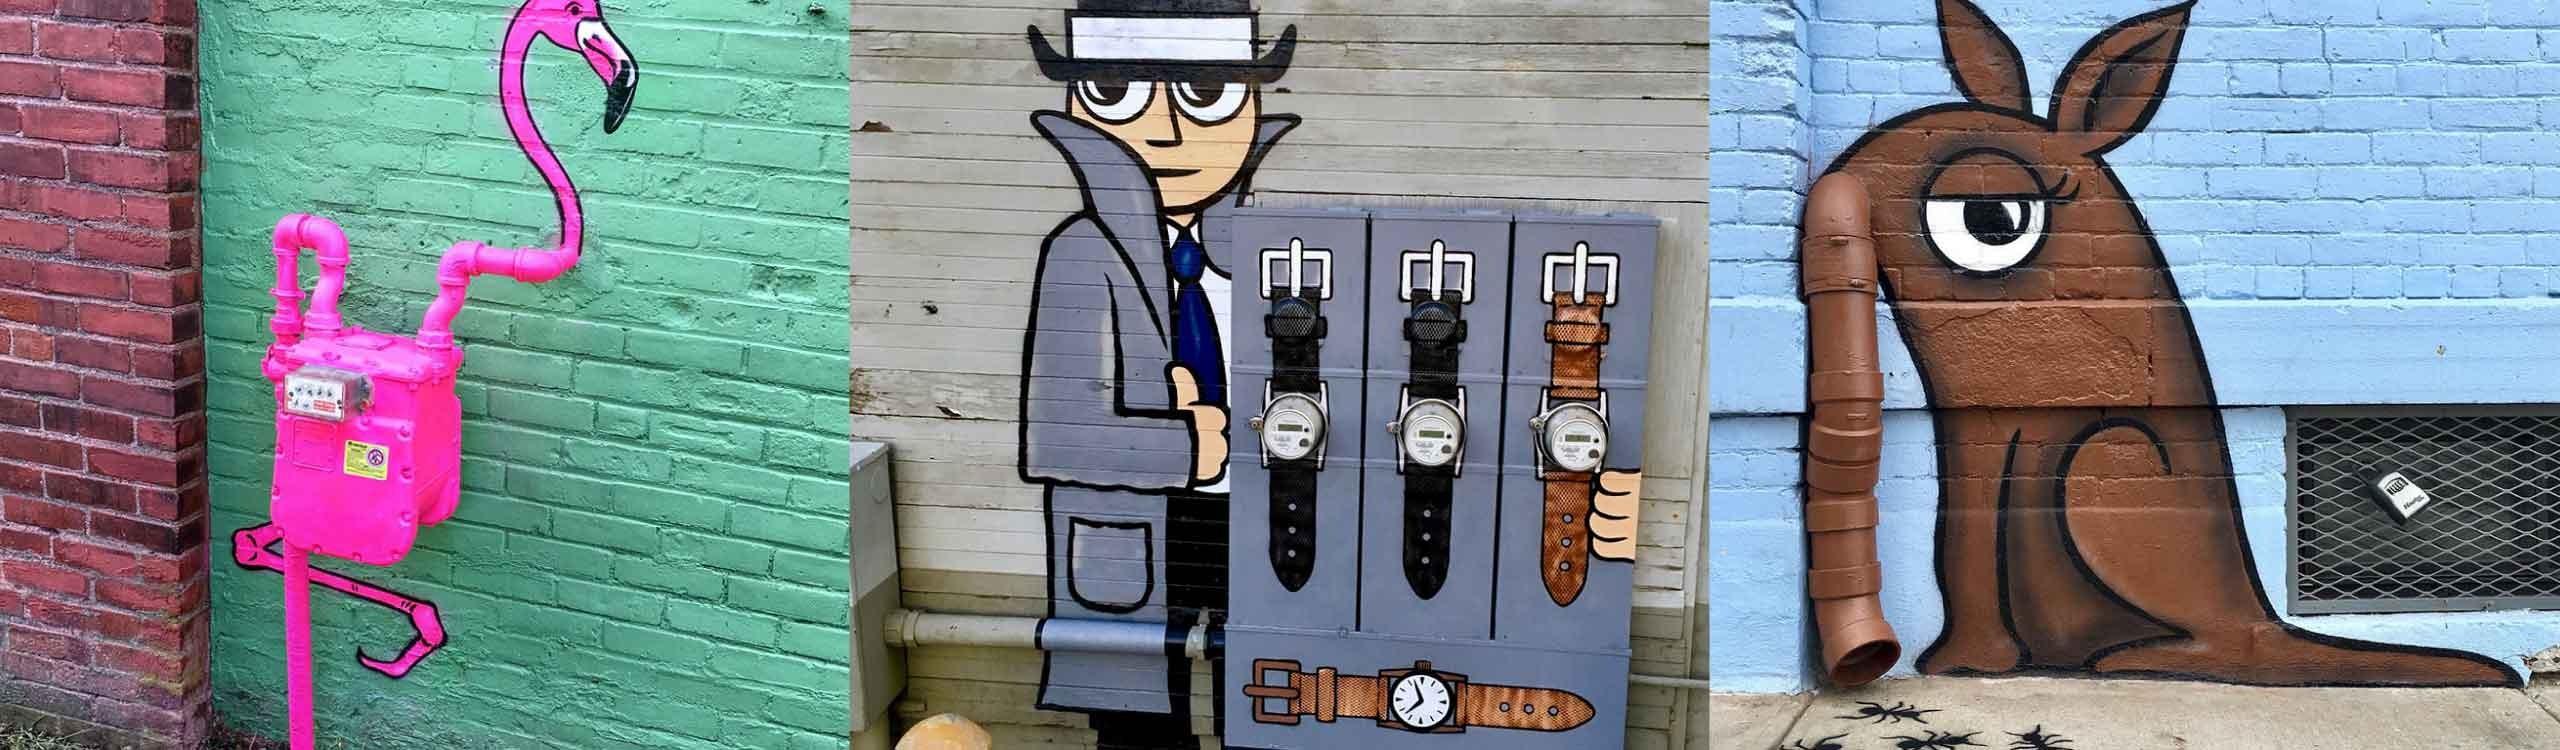 tom-bob-street-art-mis-gafas-de-pasta-destacado